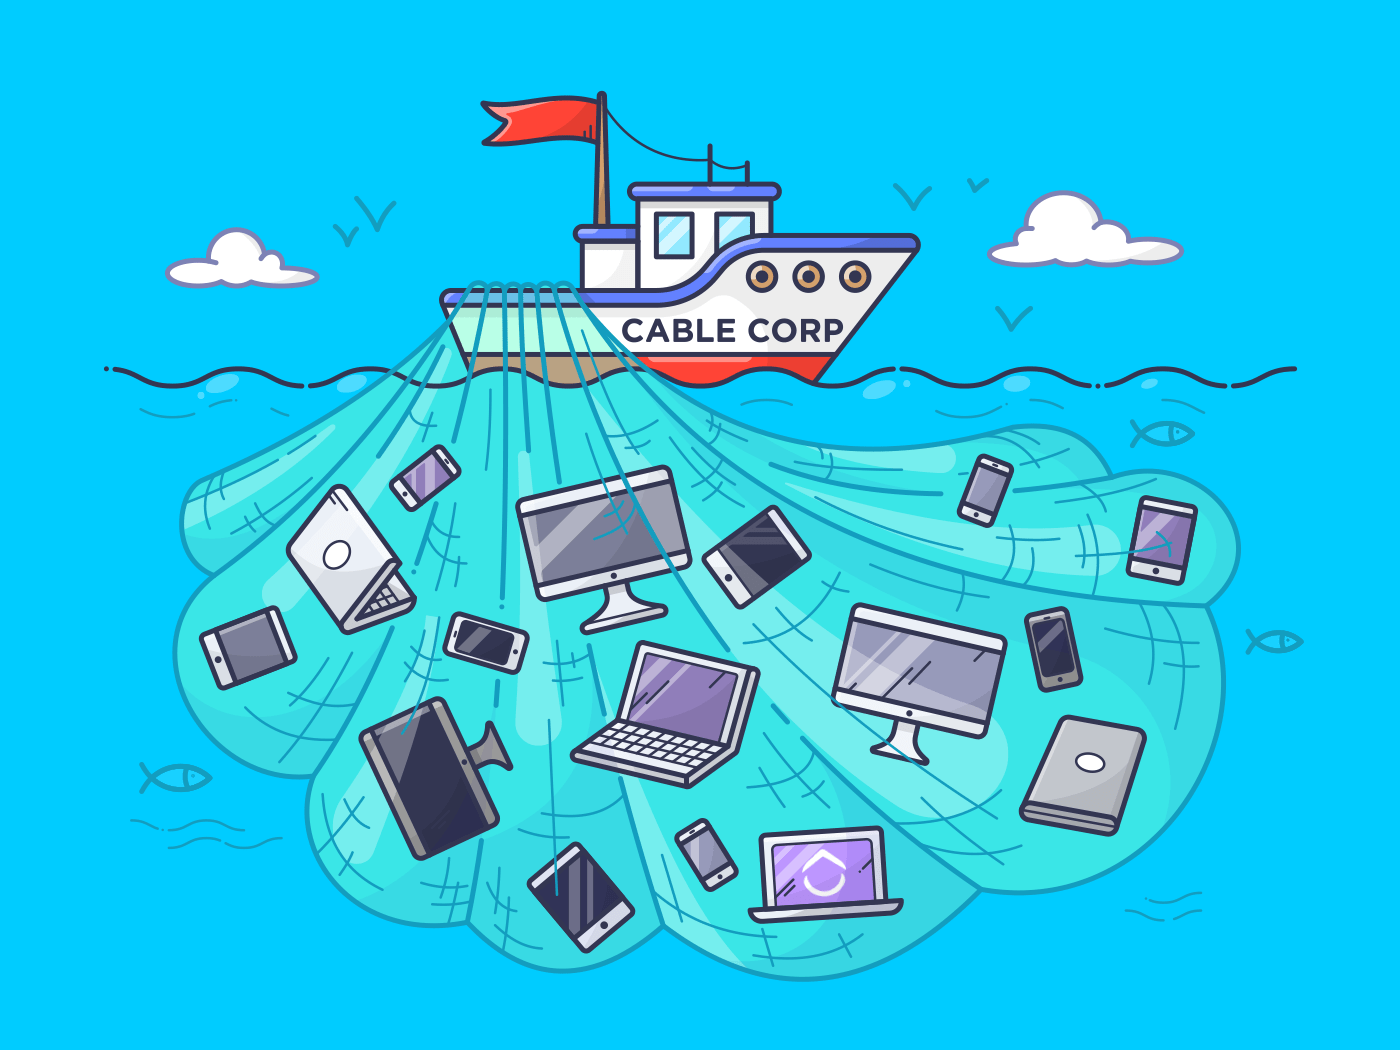 Getting Rid of Net Neutrality?